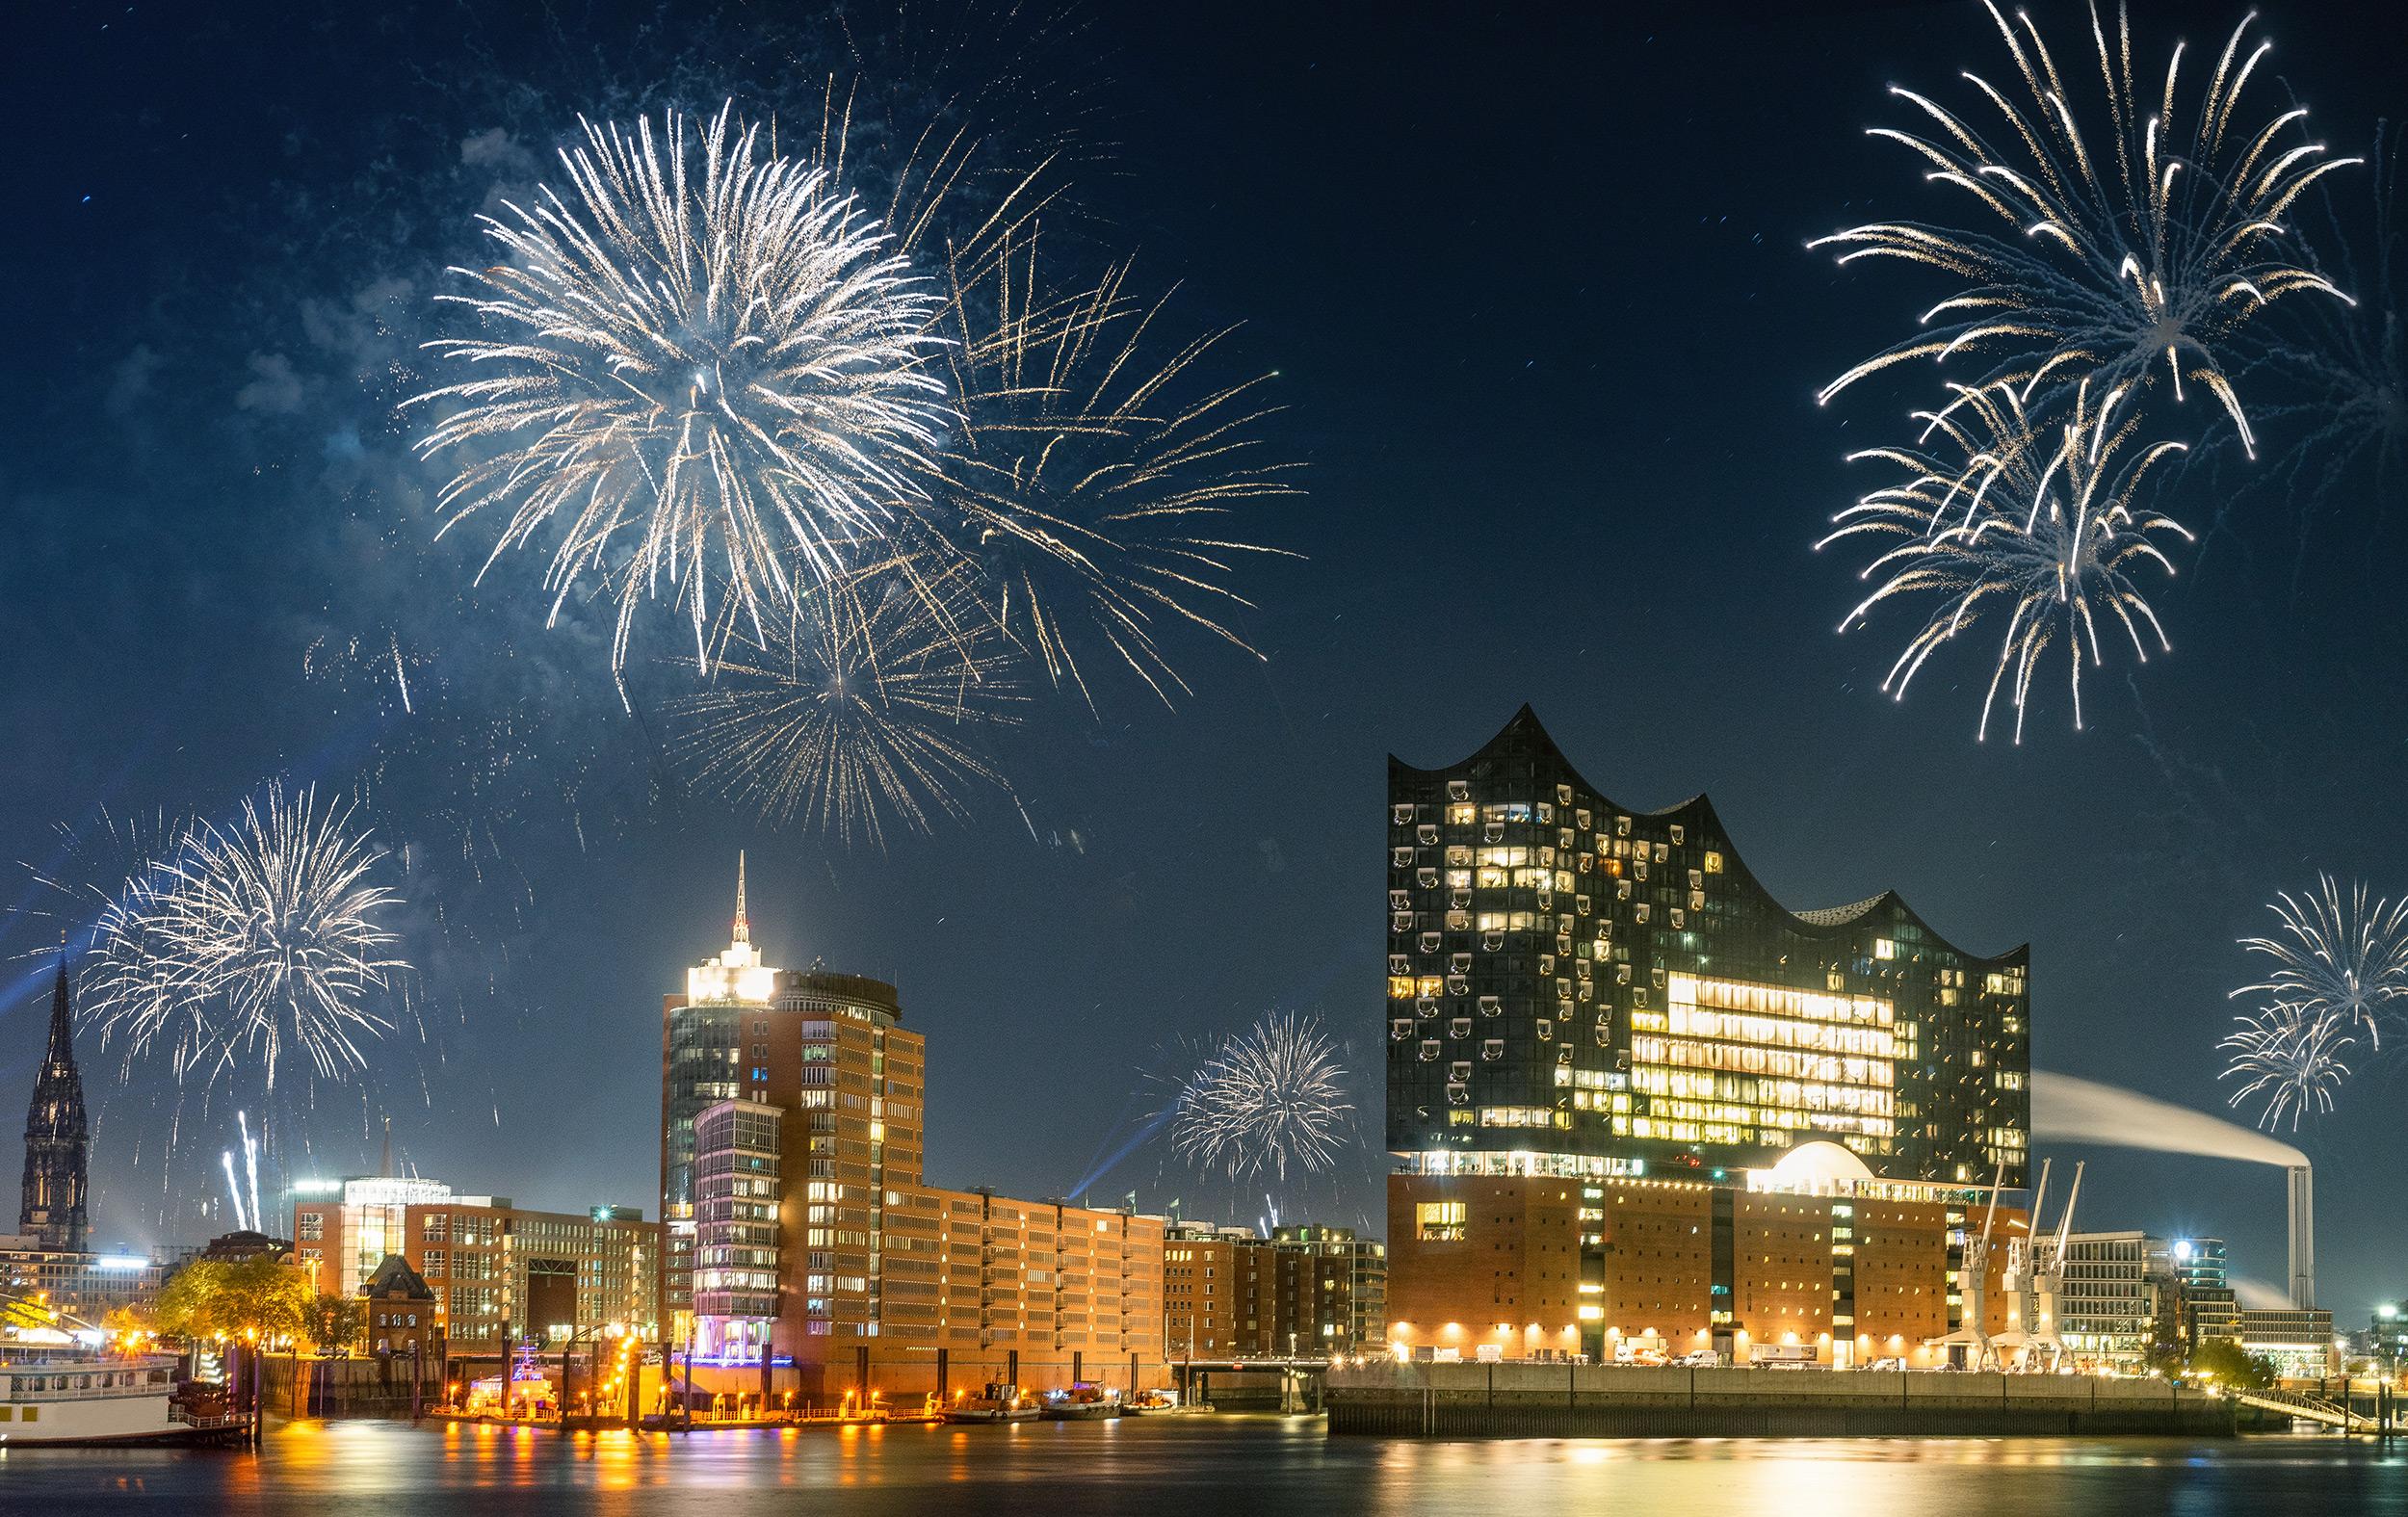 Silvester Feiern In Hamburg